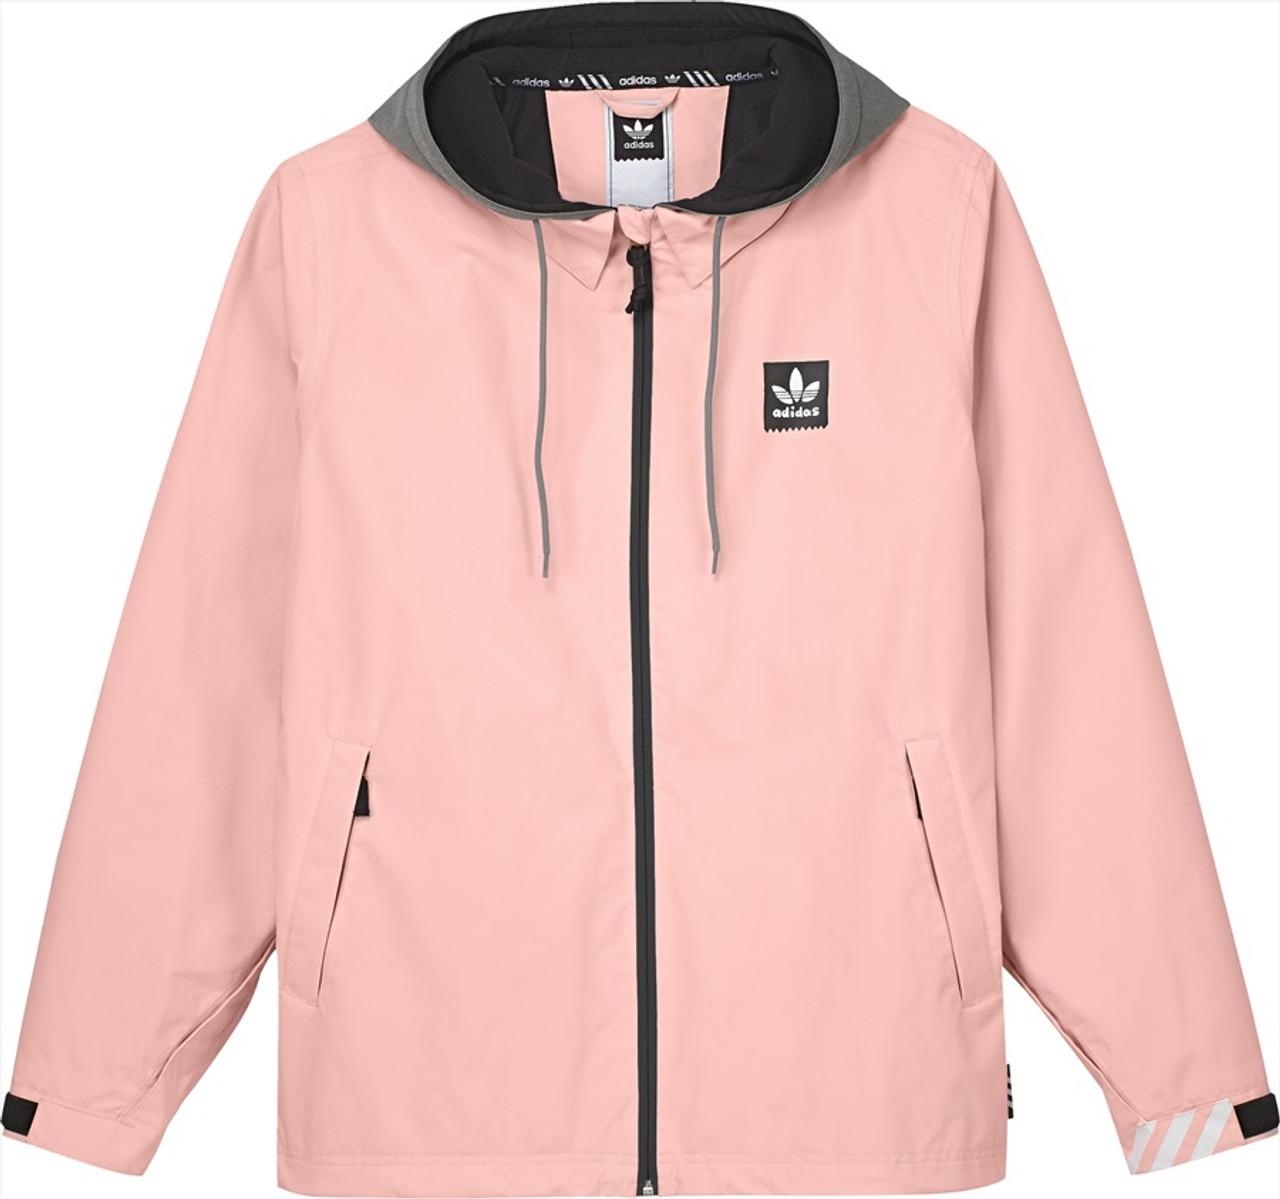 Adidas Civilian Snow Jackets Mens Gonz Coral Pink Boardparadise Com